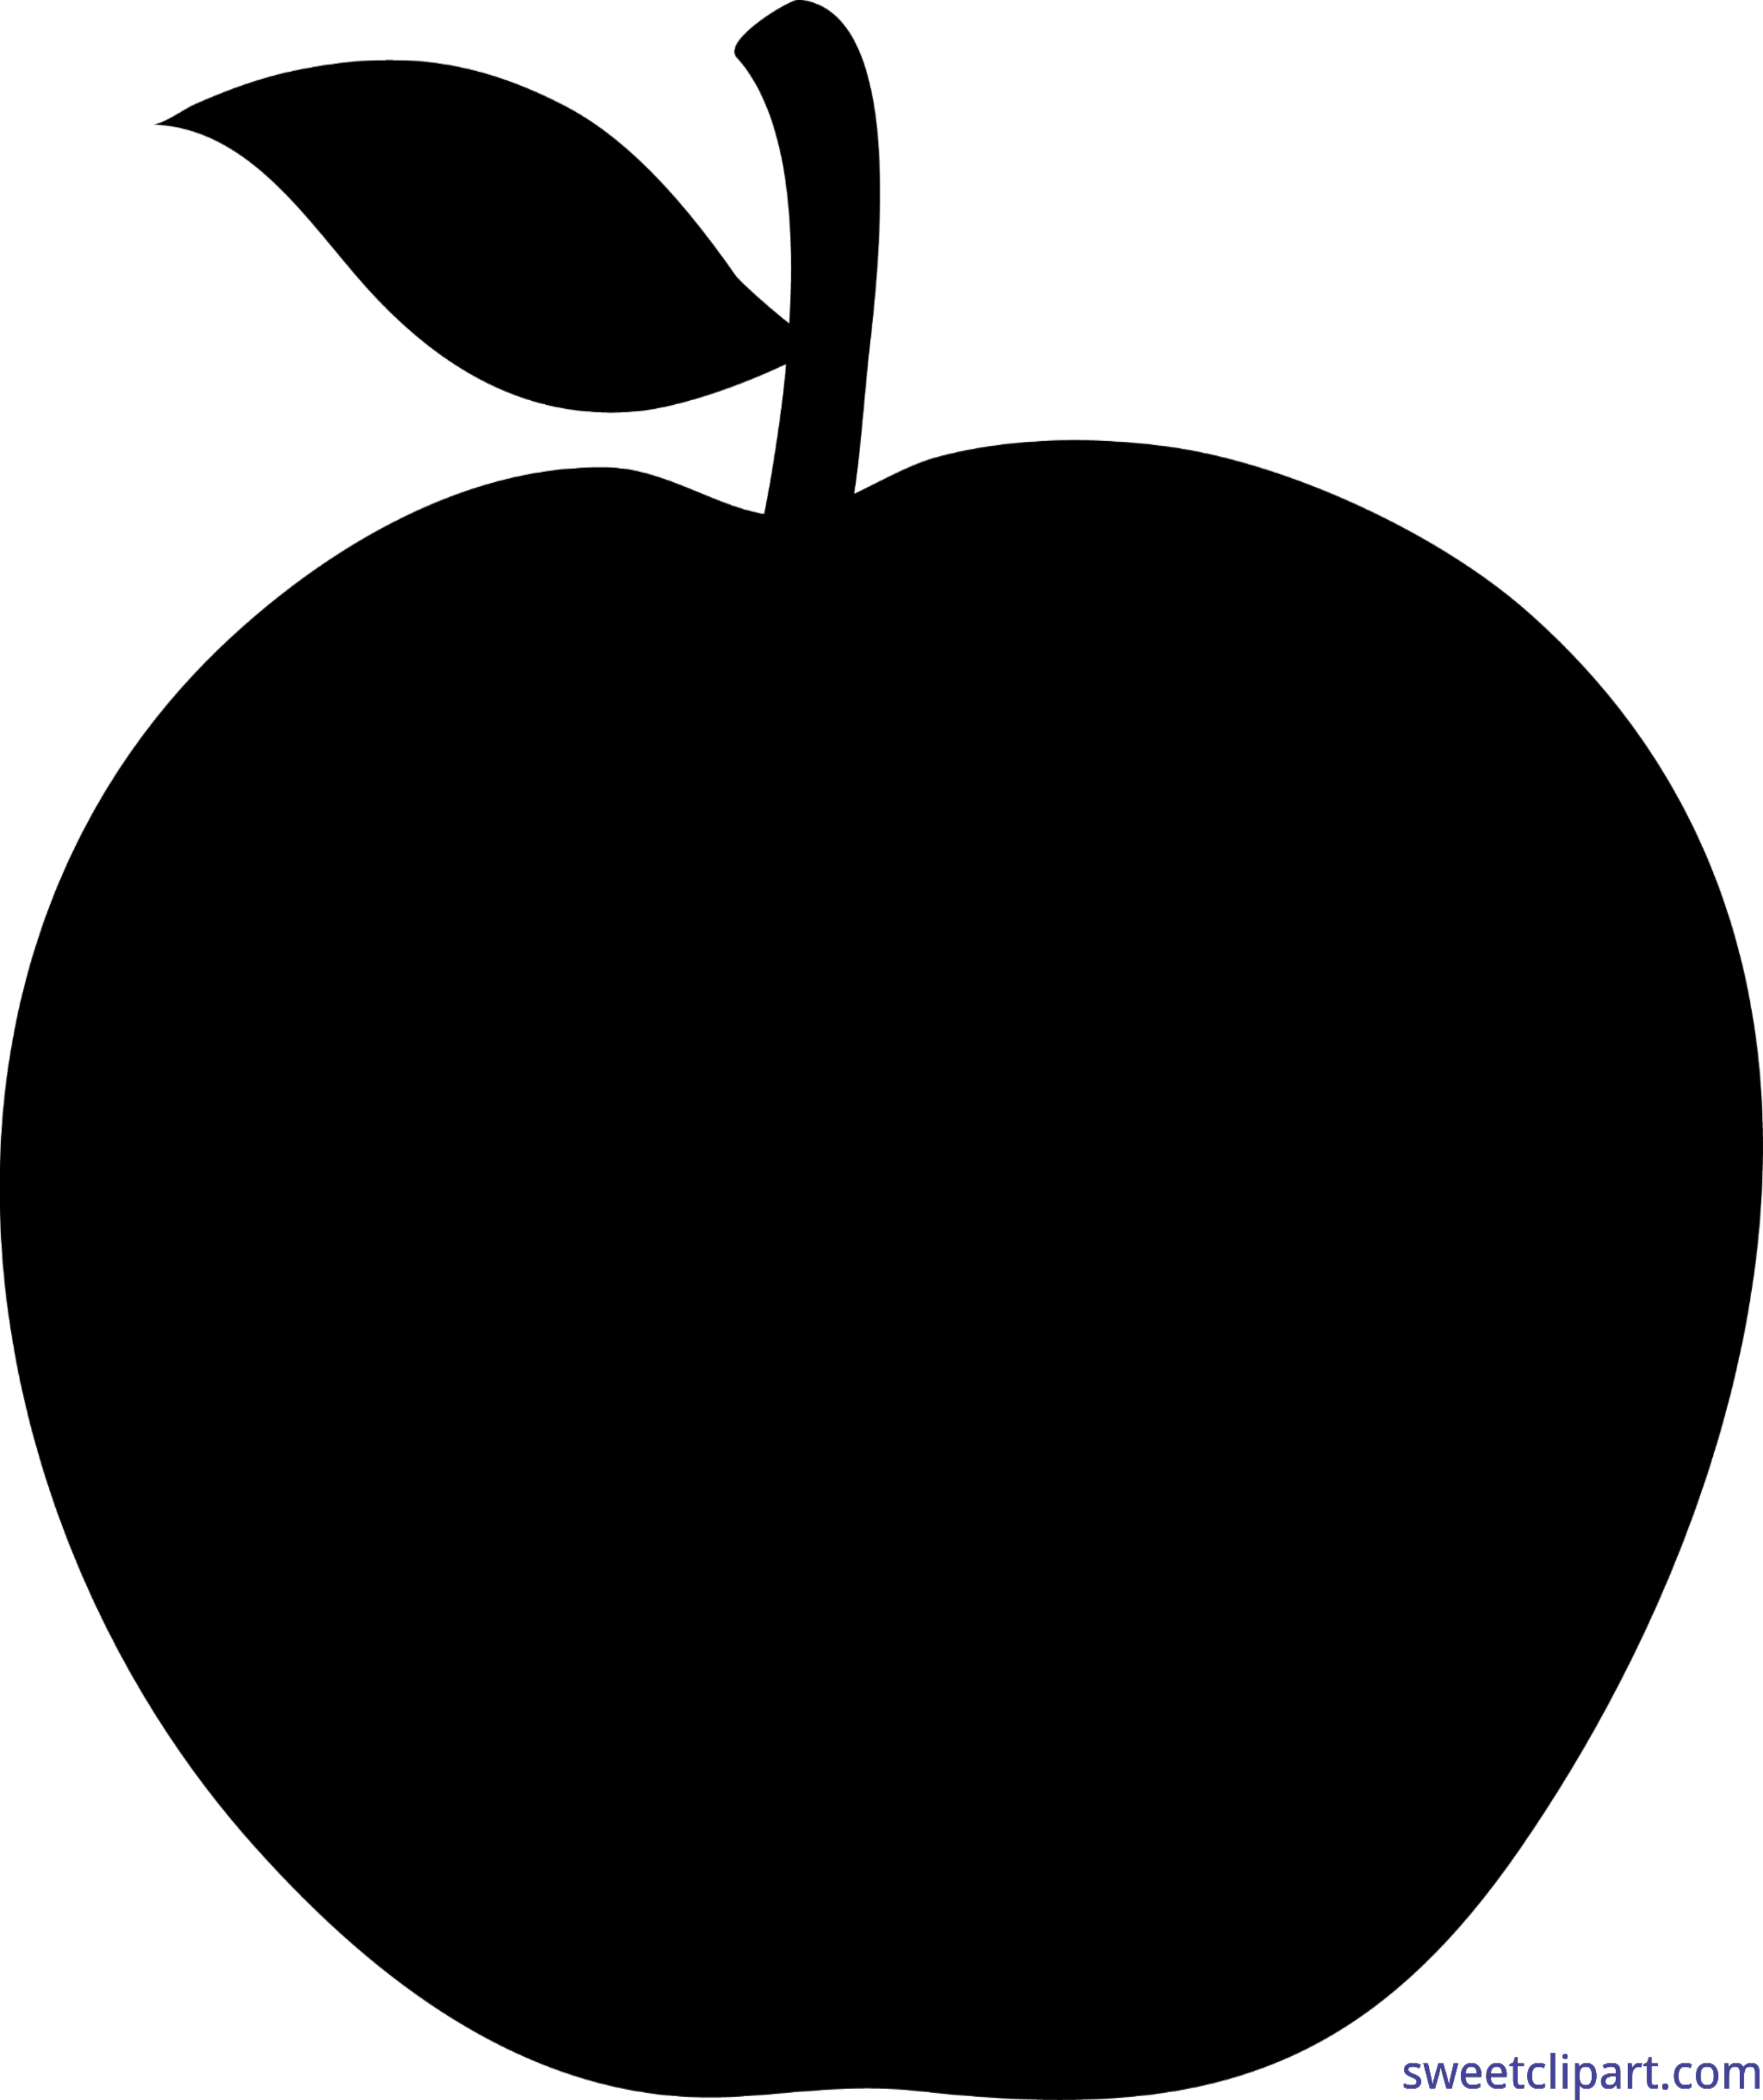 Apple Black Silhouette Clip Art.